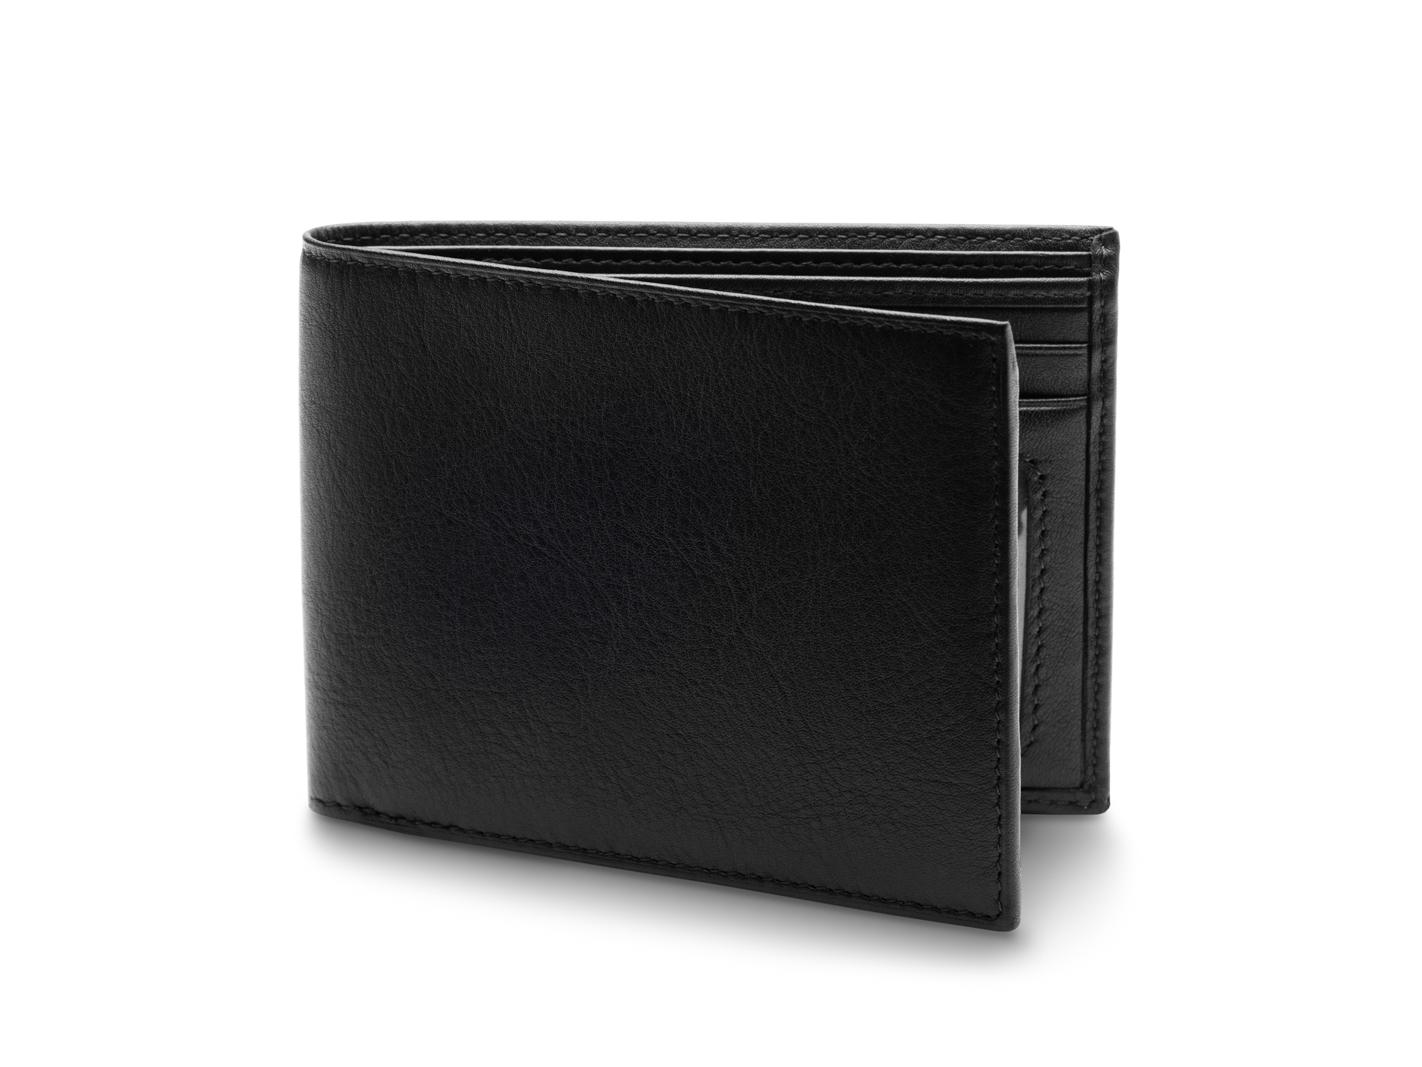 Executive ID Wallet - 100 Black